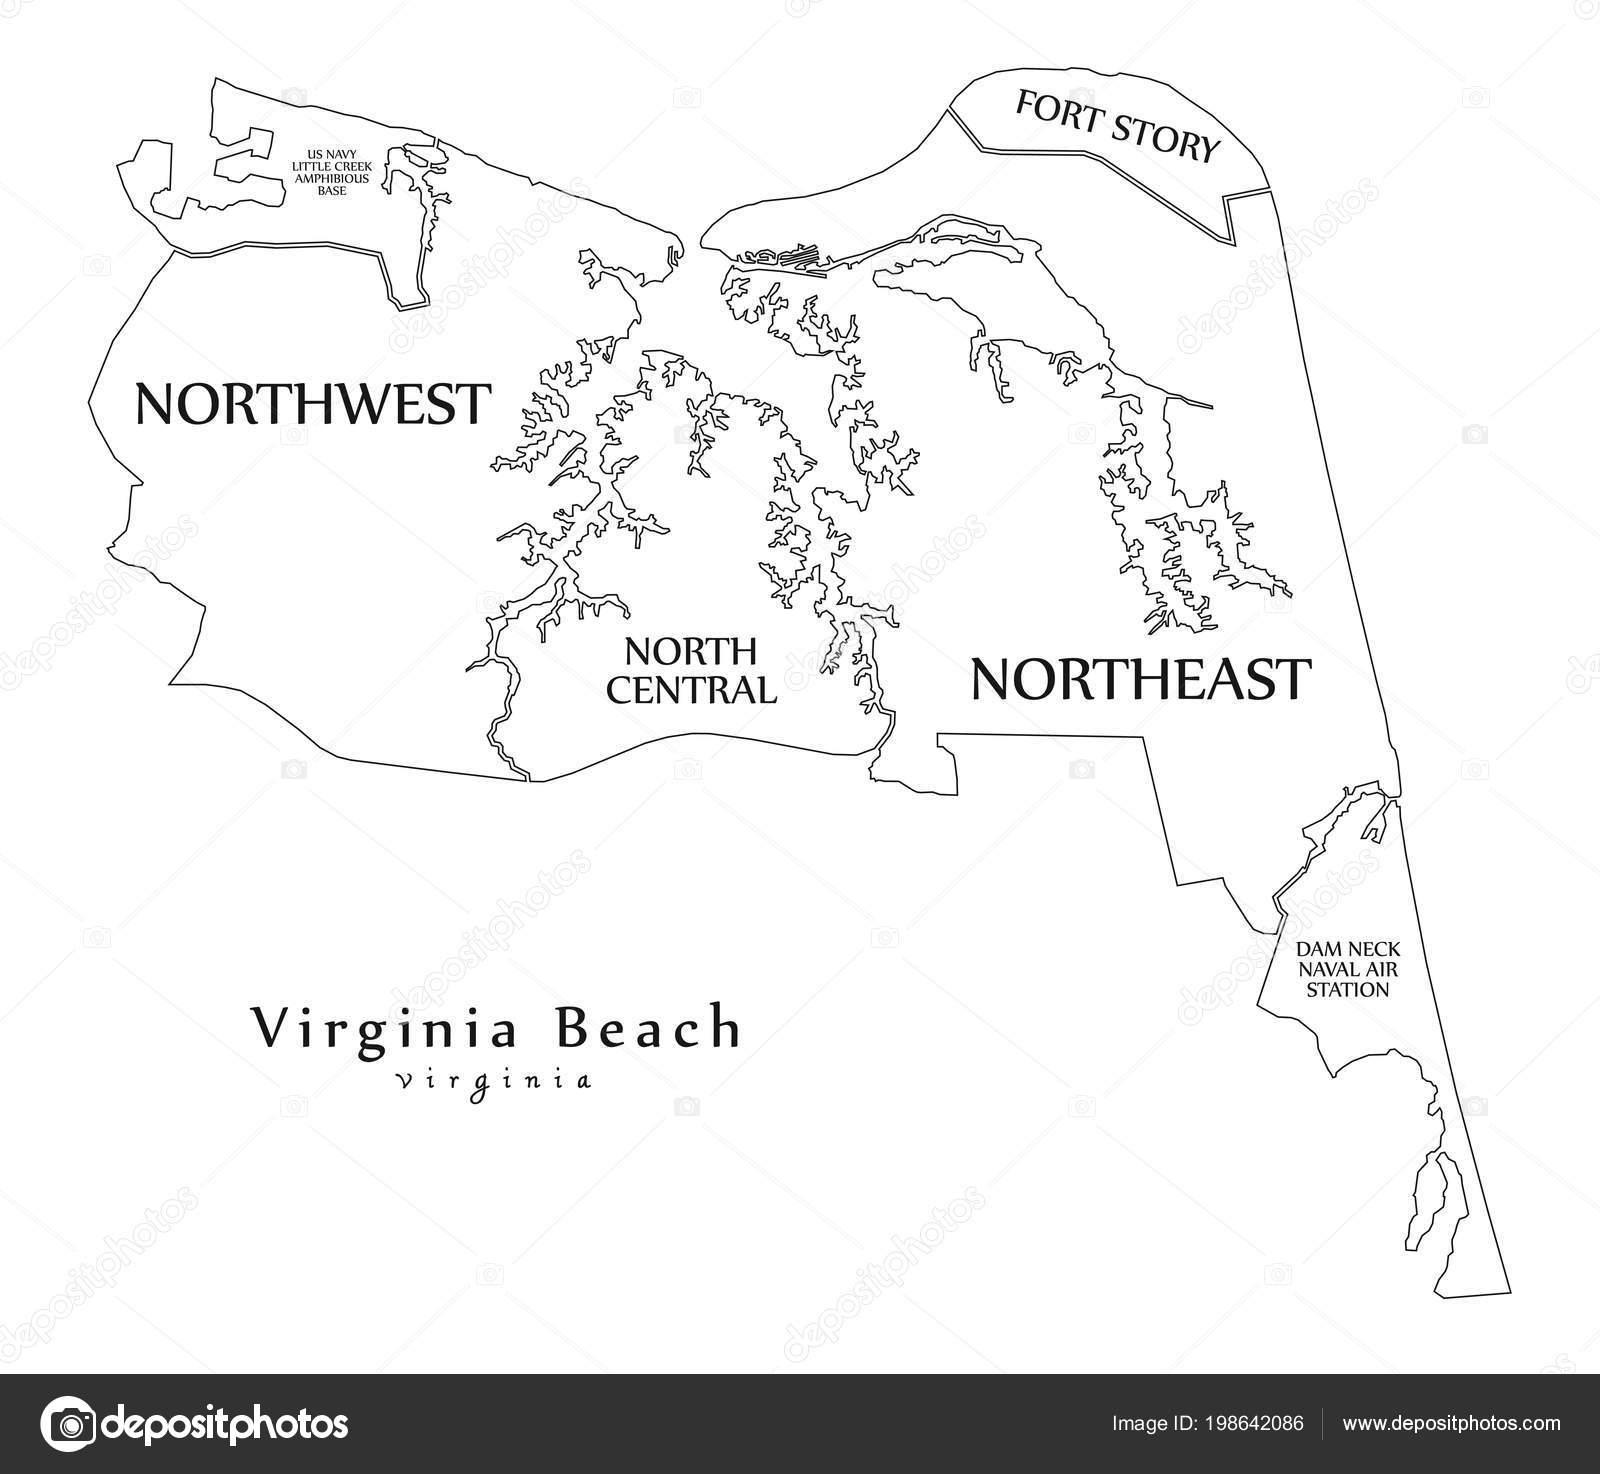 Modern City Map Virginia Beach City Usa Neighborhoods Titles Outline